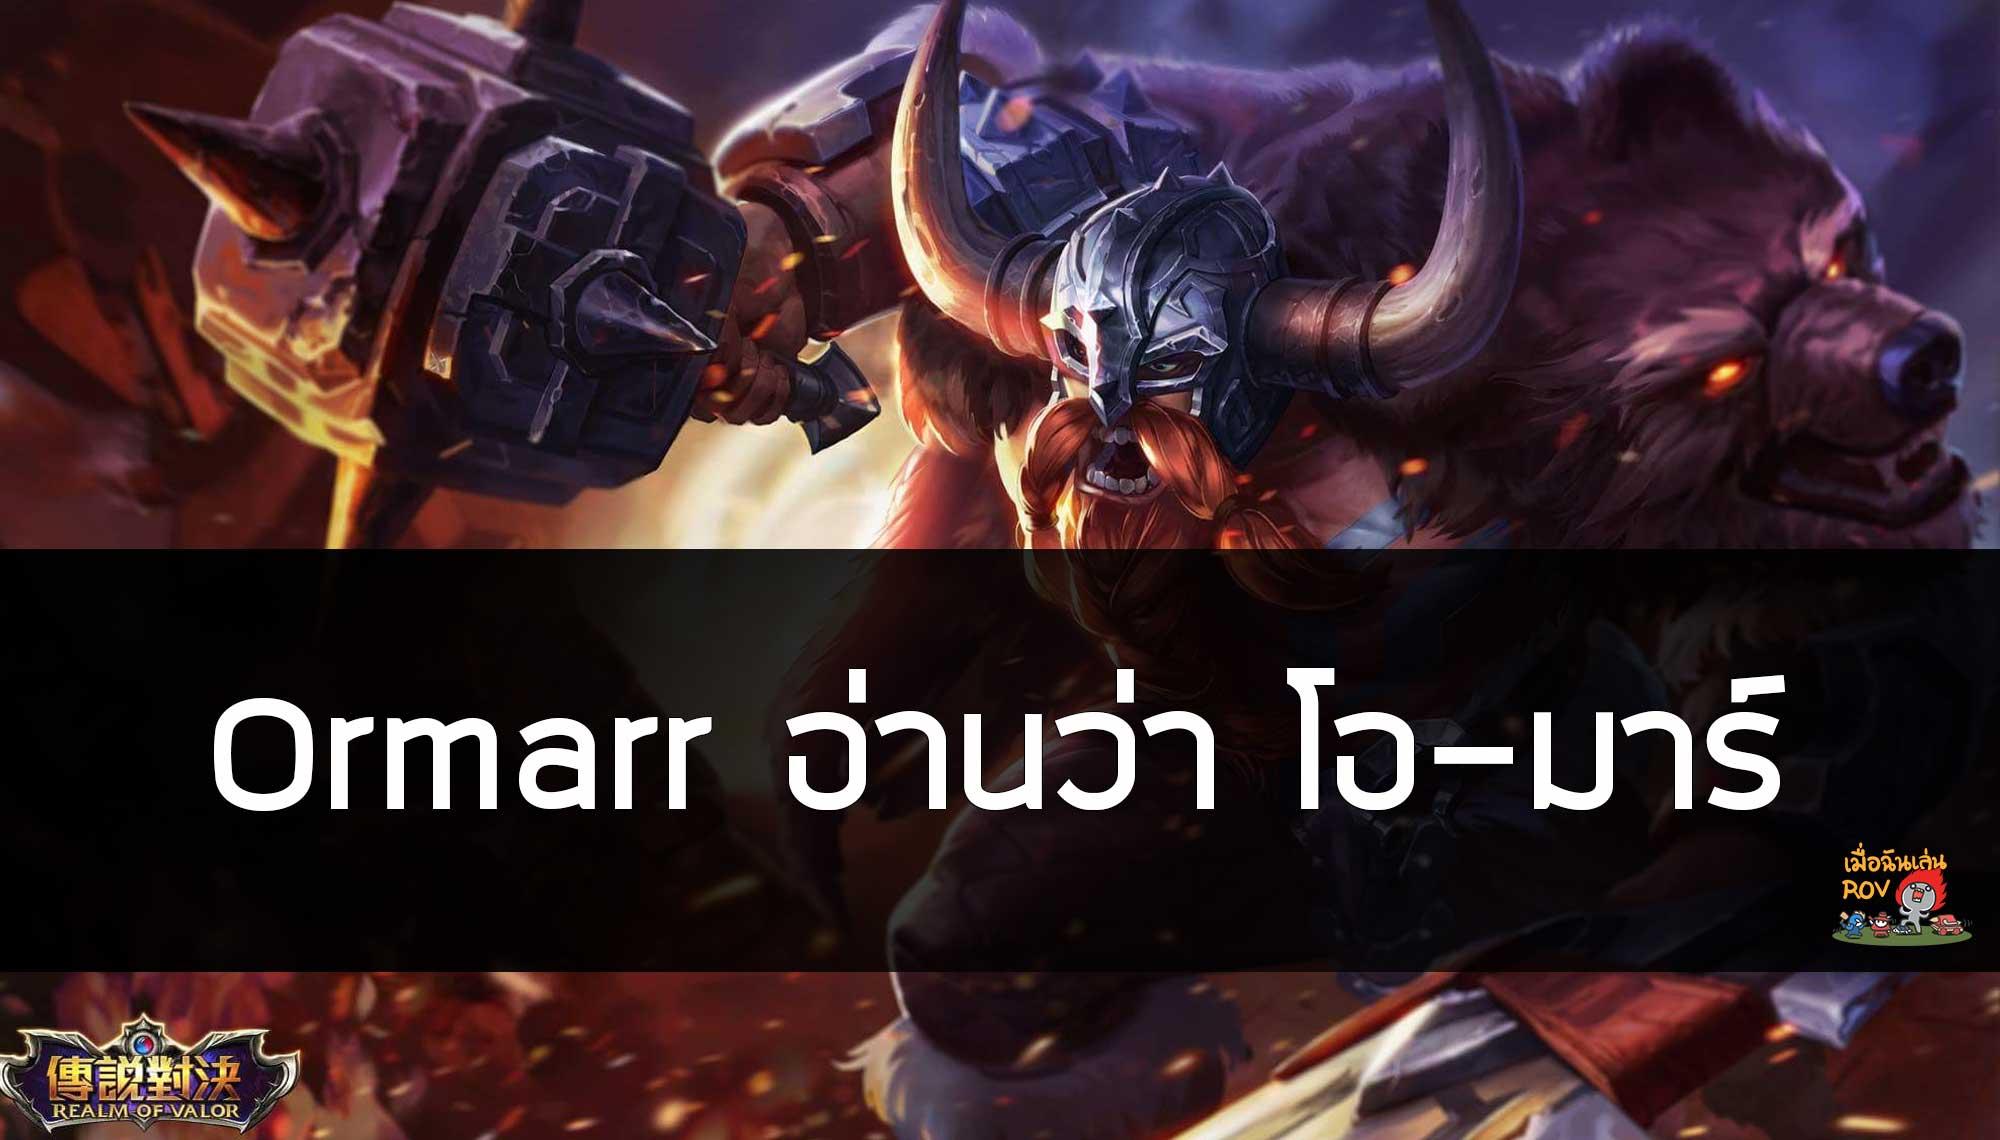 Ormarr อ่านว่า โอ-มาร์